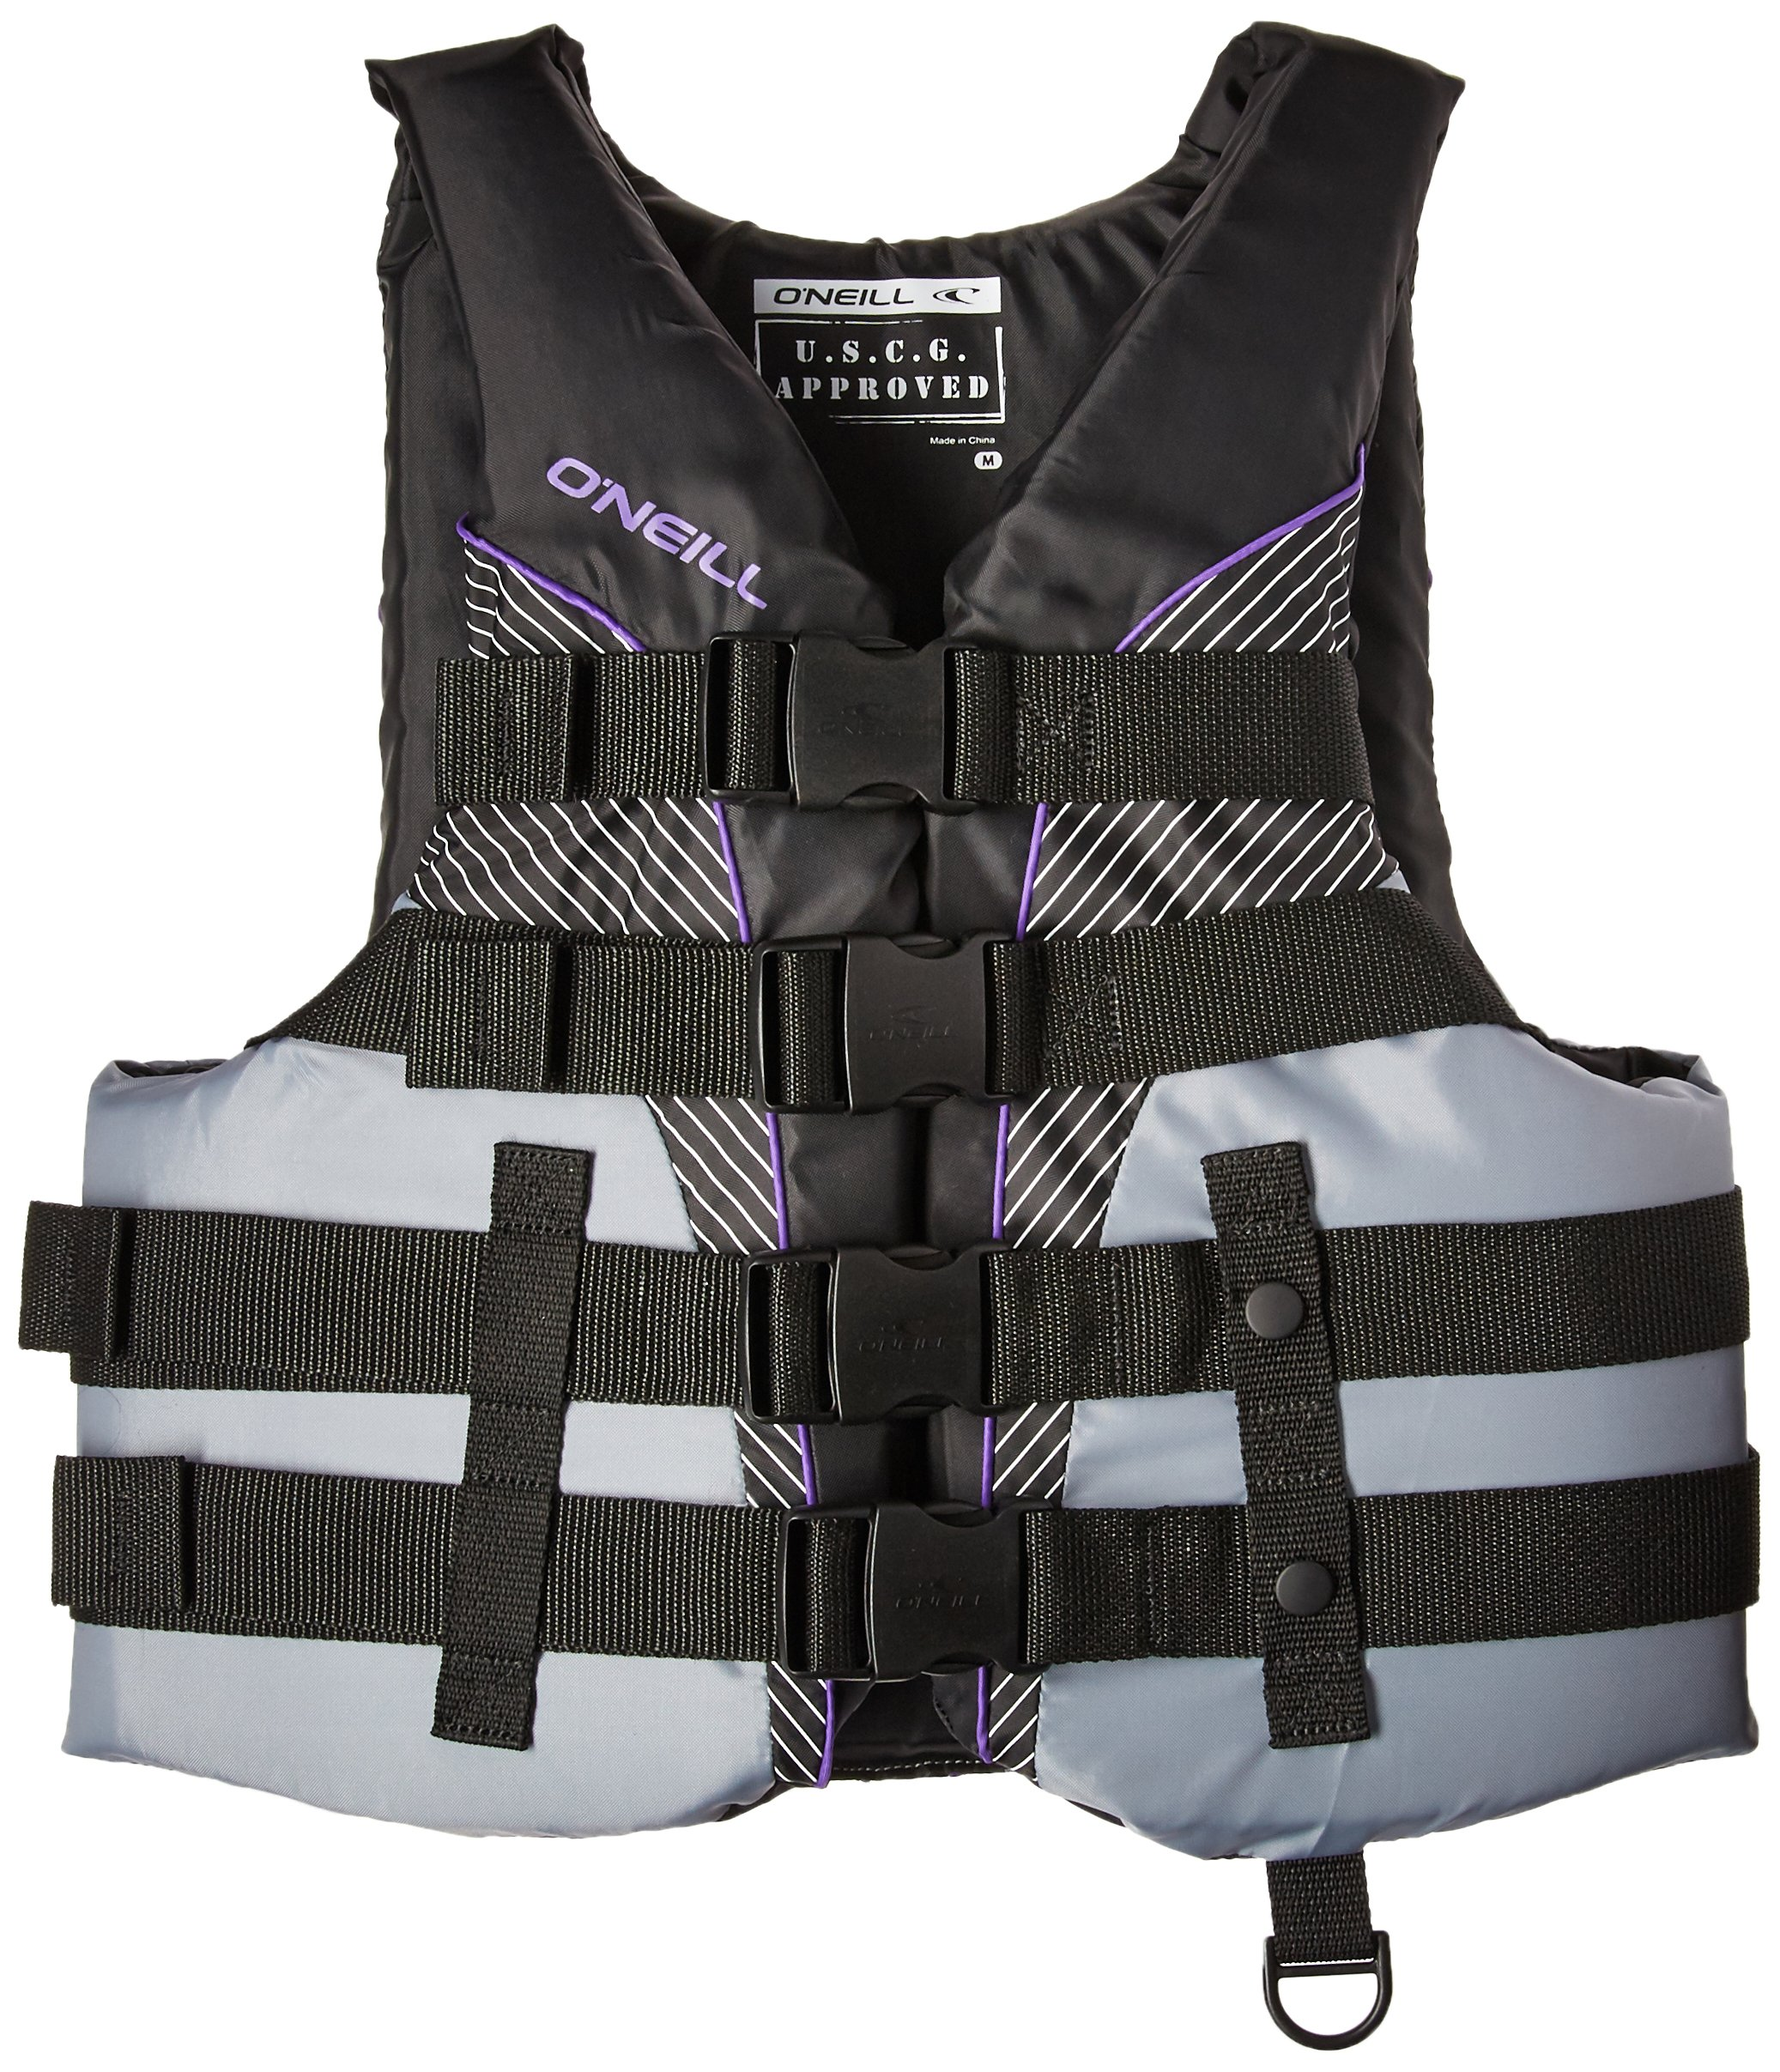 O'Neill   Women's SuperLite USCG Life Vest ,Black/Smoke/Black/UV,Small by O'Neill Wetsuits